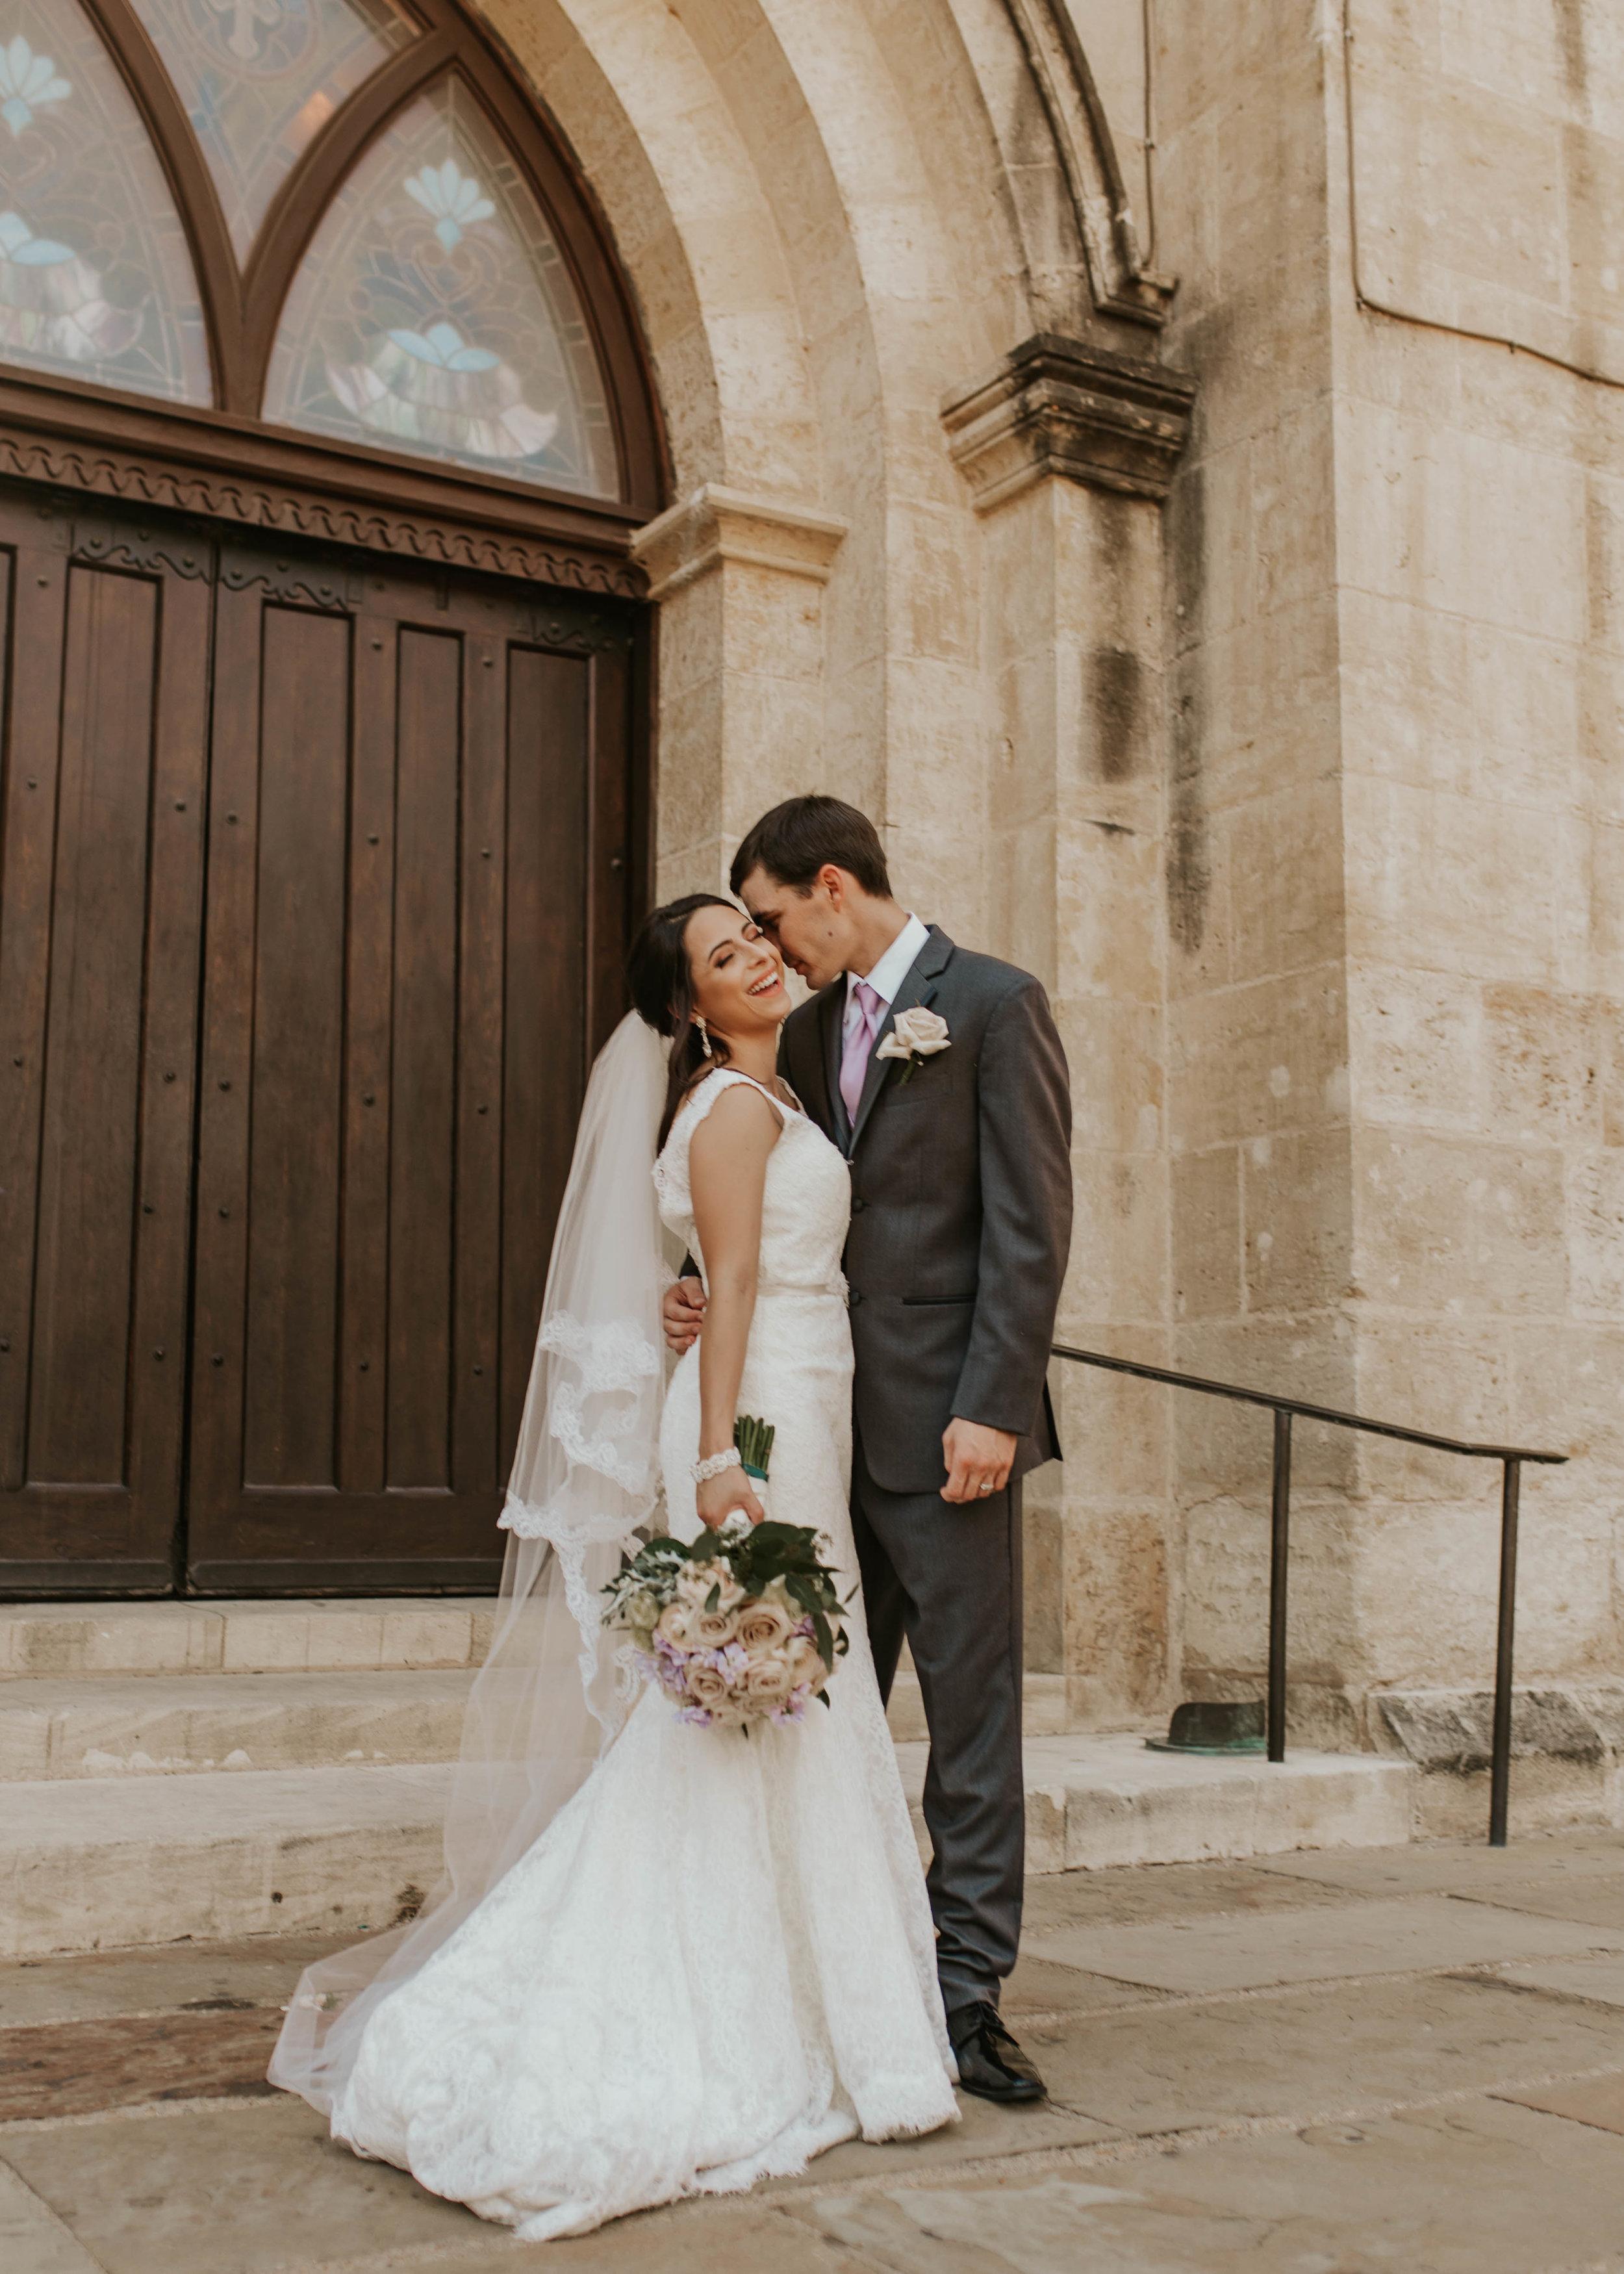 Marrisa_Nick_Wedding-64.jpg